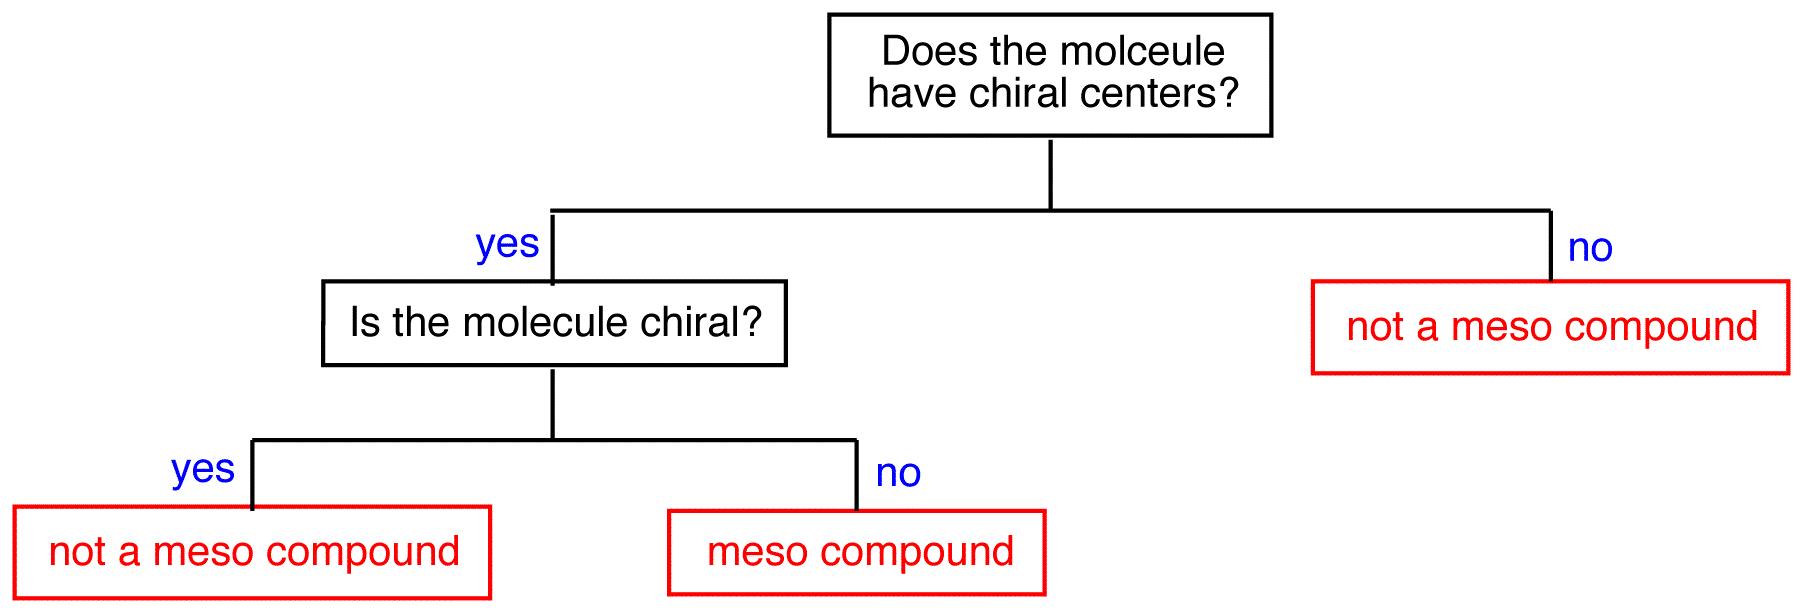 Meso Compound Answers Ochempal